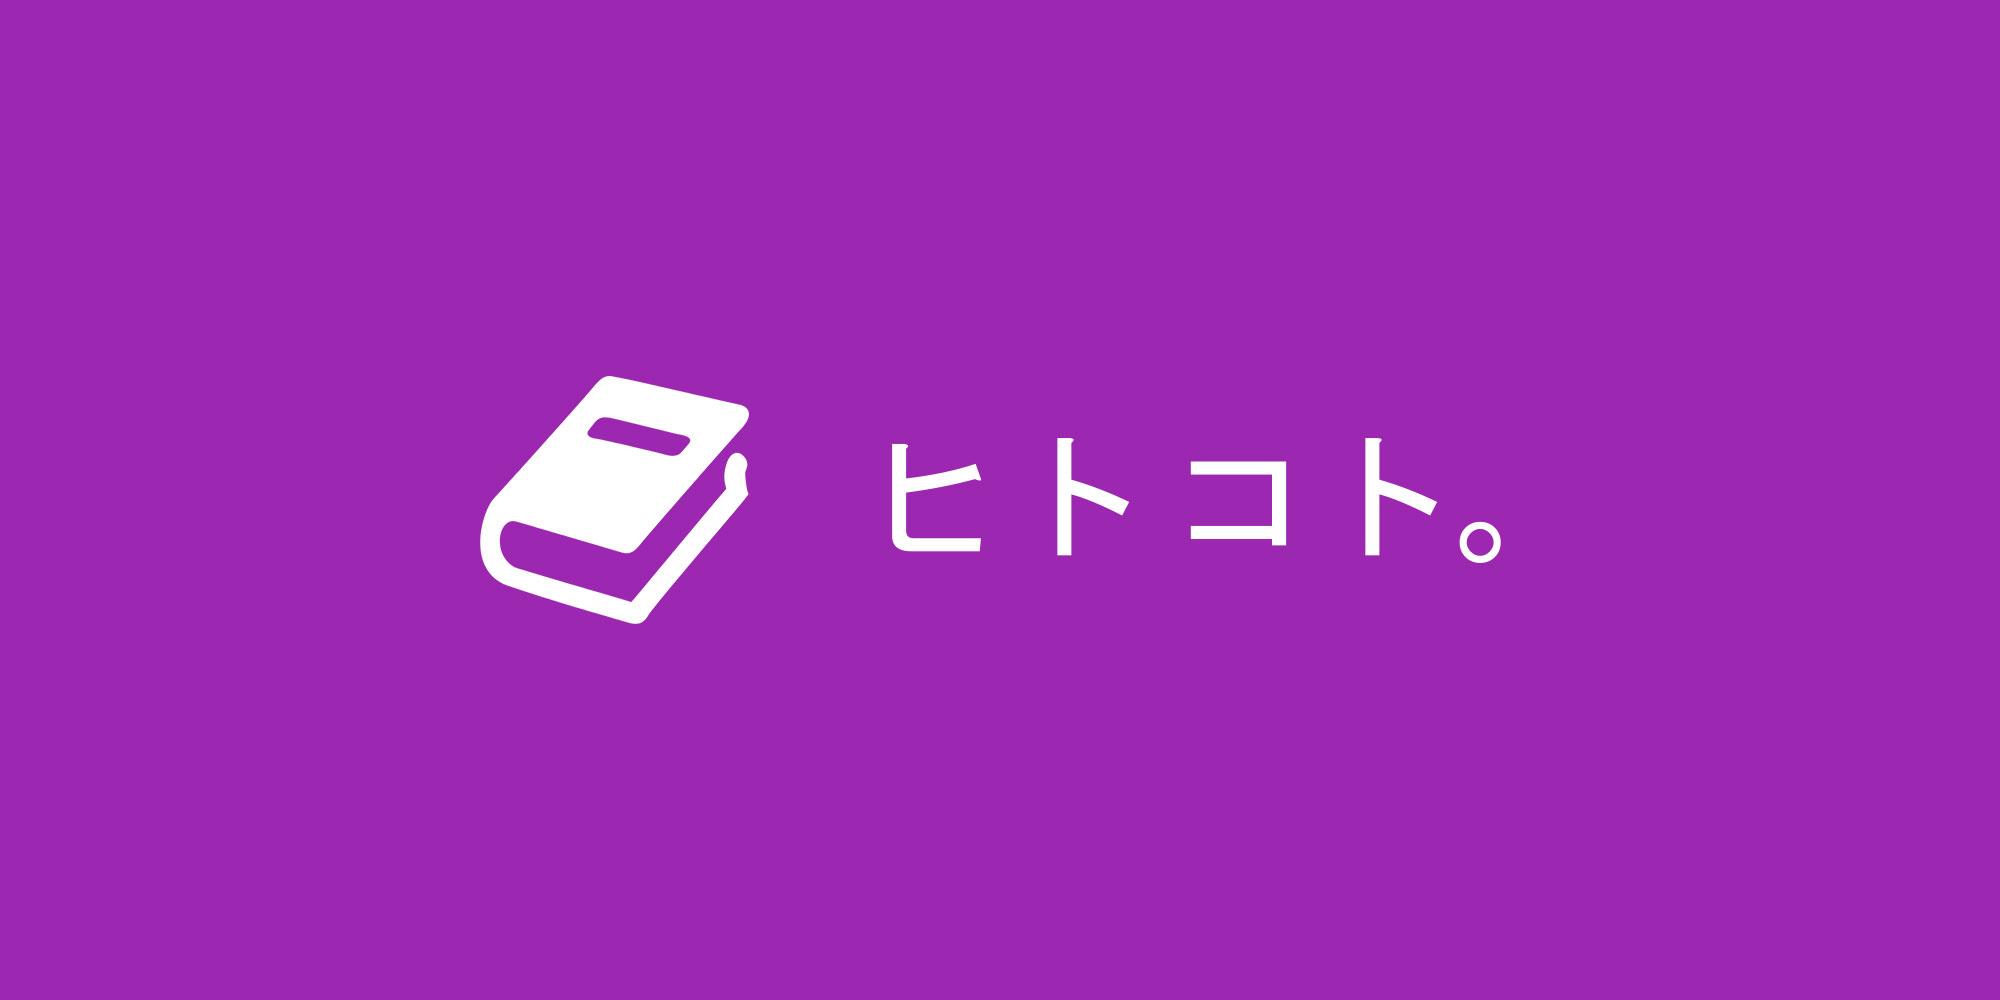 https://www.freejishu.com/wp-content/uploads/2016/08/hitokoto.jpg